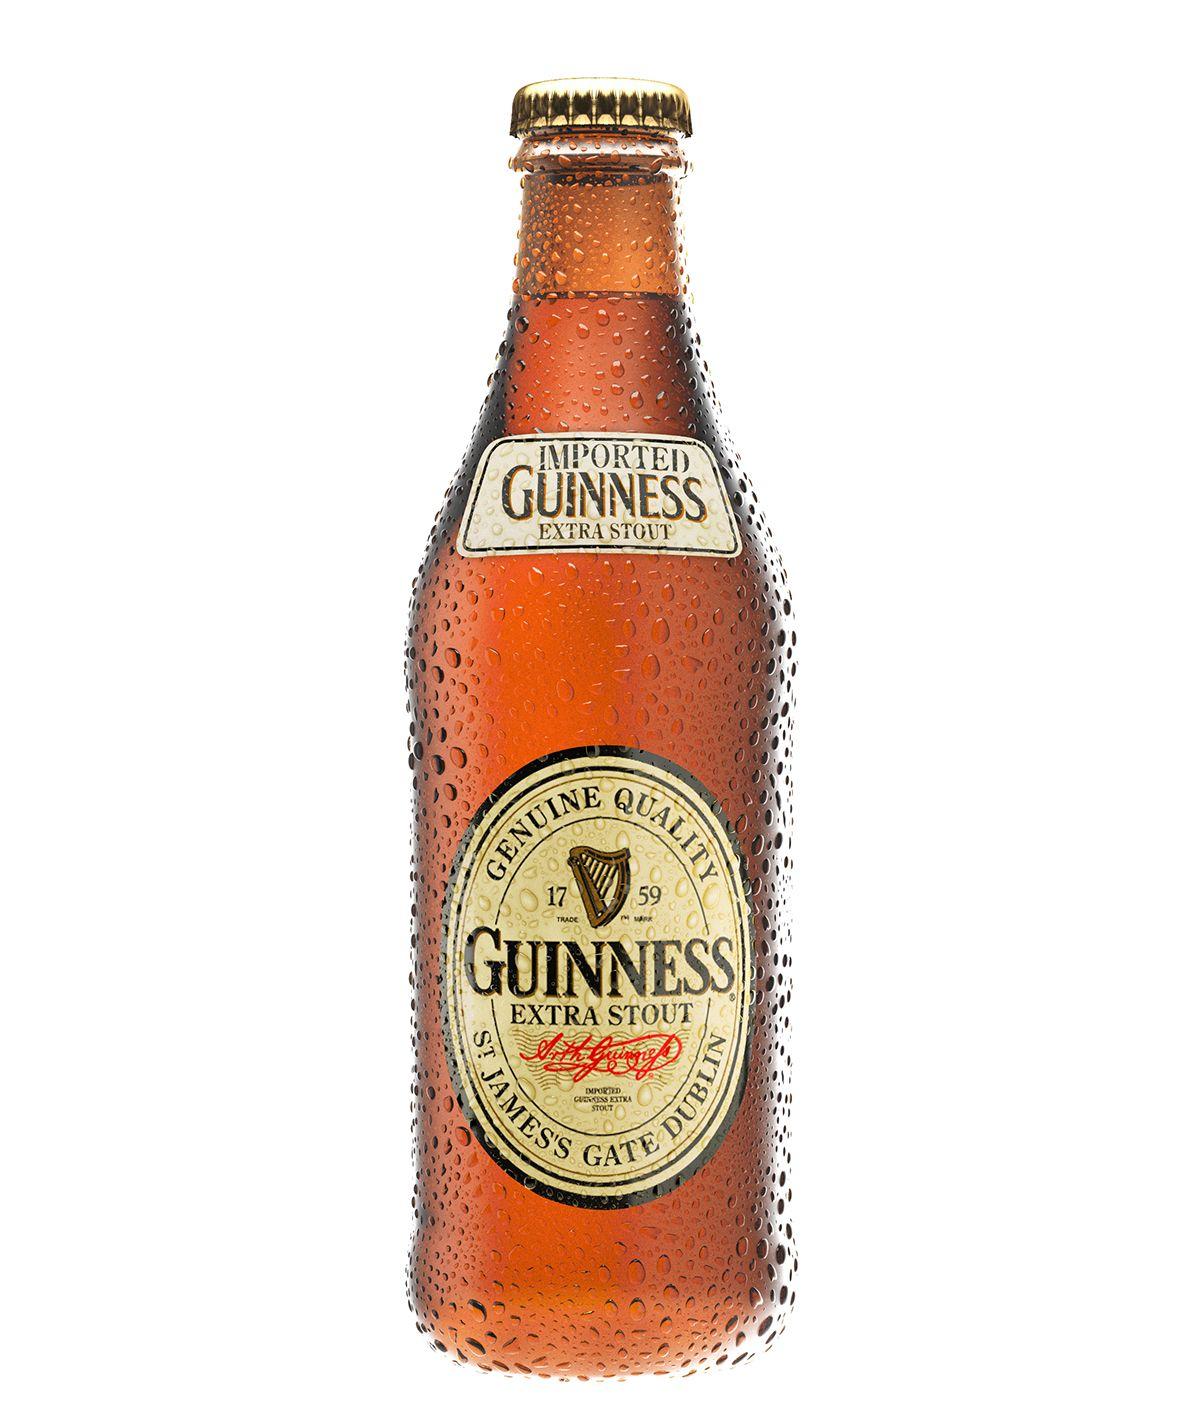 https://www.behance.net/gallery/34192163/Guinness-Extra-Stout